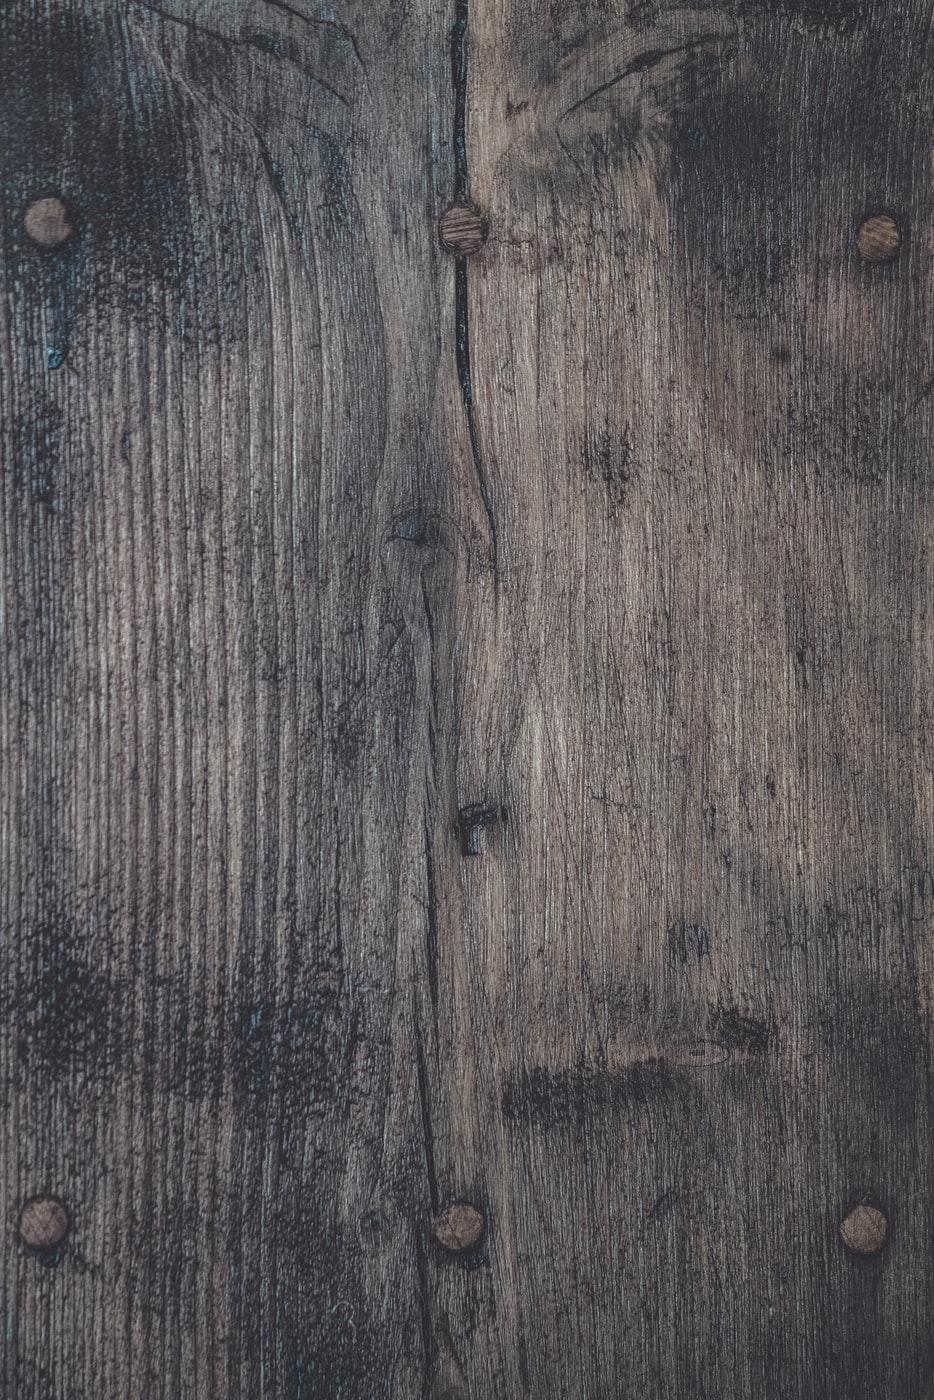 wood plank linkedin background